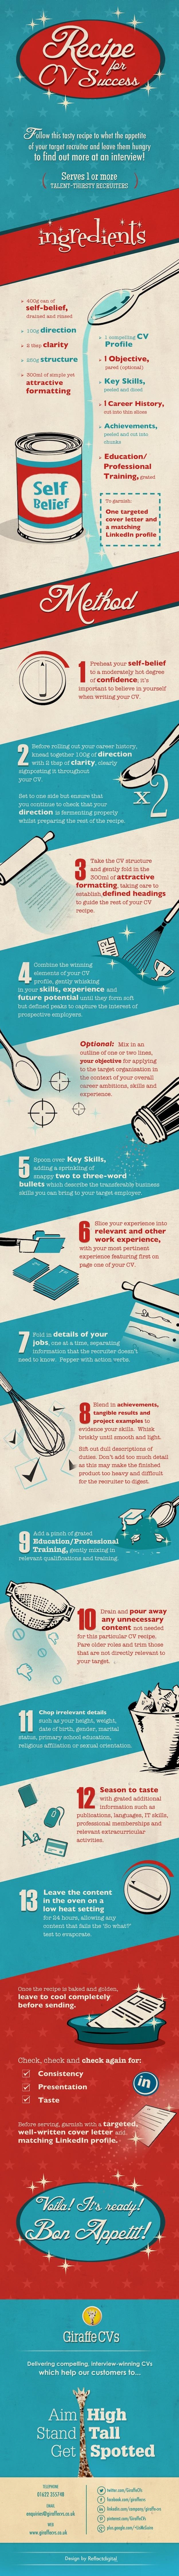 recipe_for_success_infographic